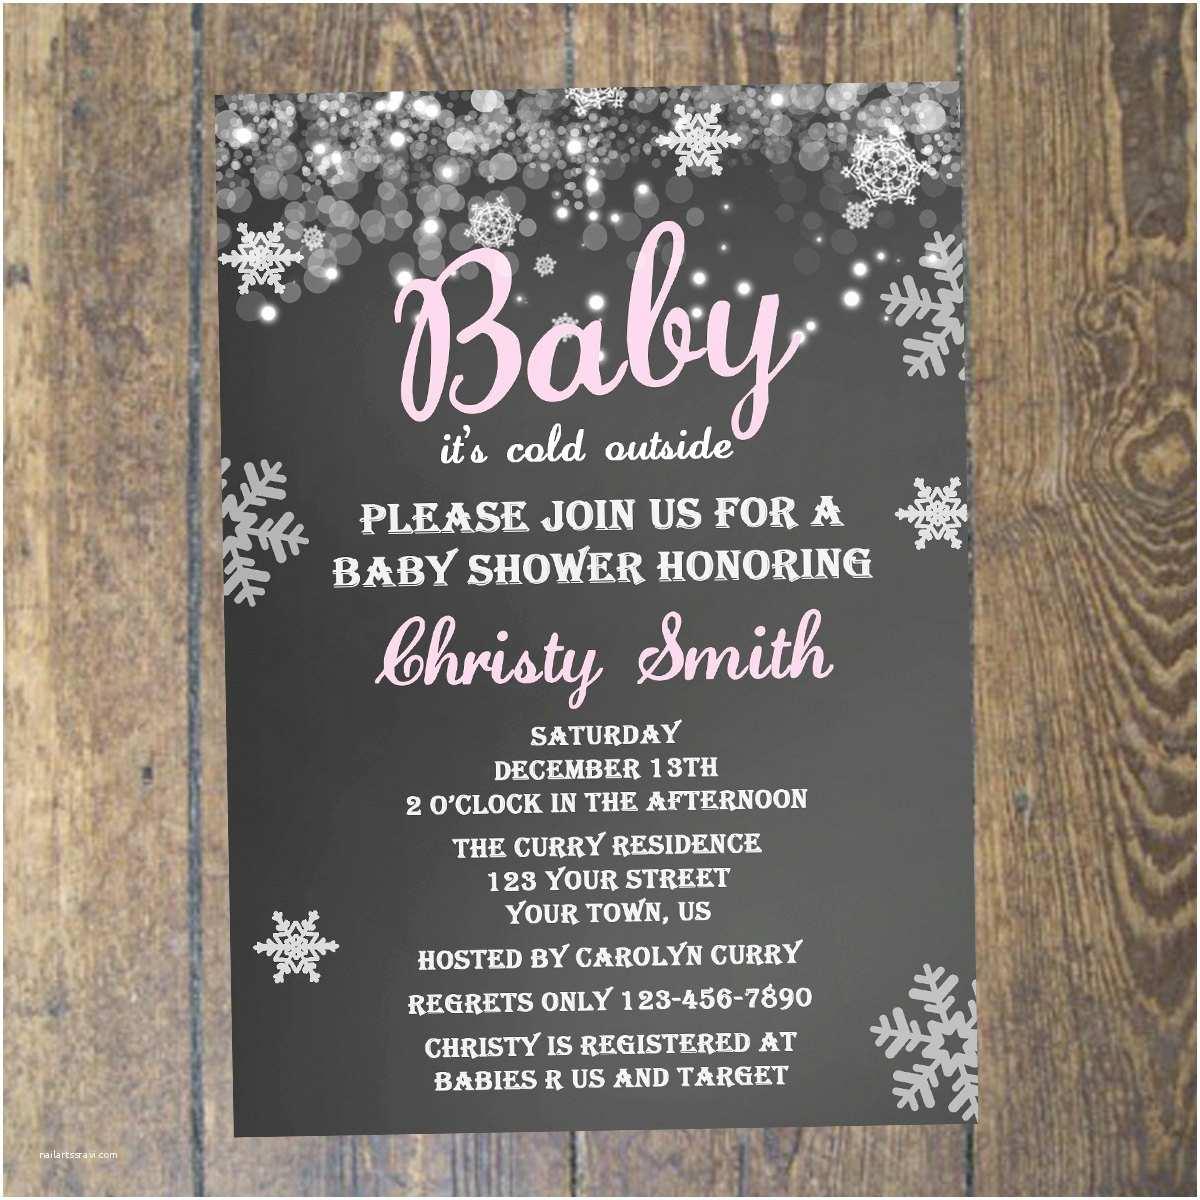 Winter Baby Shower Invitations theme Winter Baby Boy Shower Invitations Winter Baby